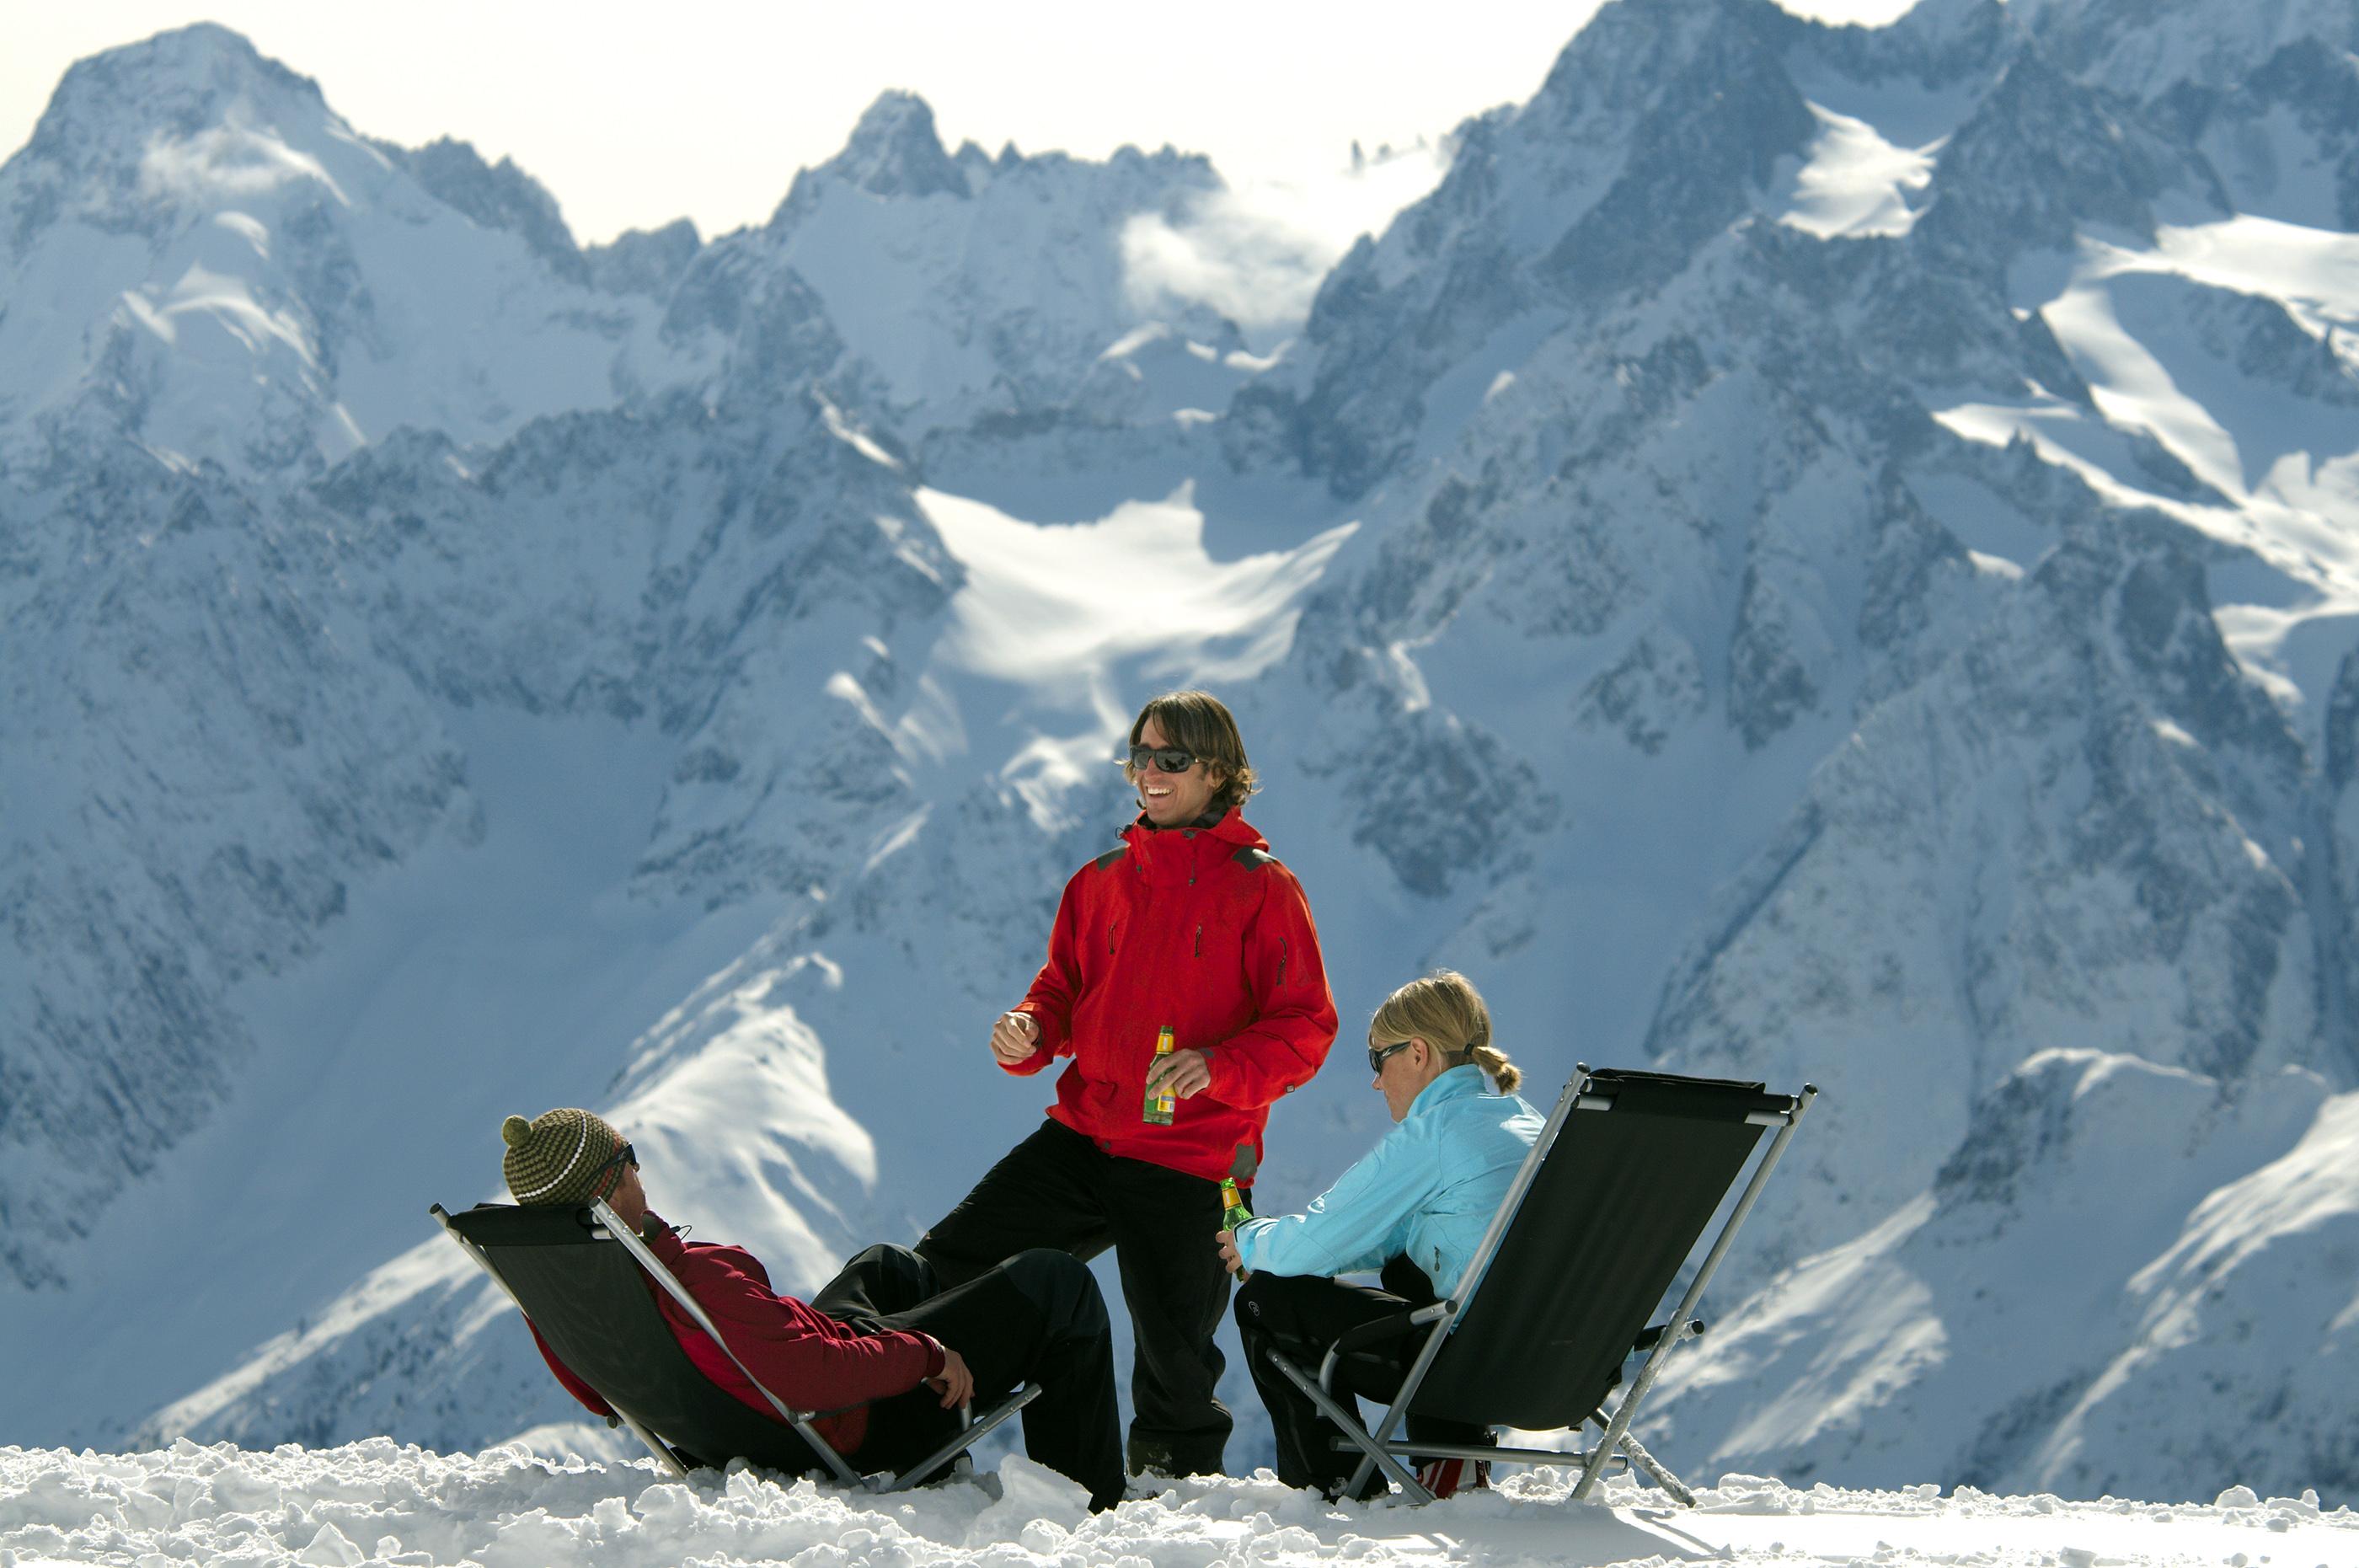 Apres_ski_Yves_Garneau-12